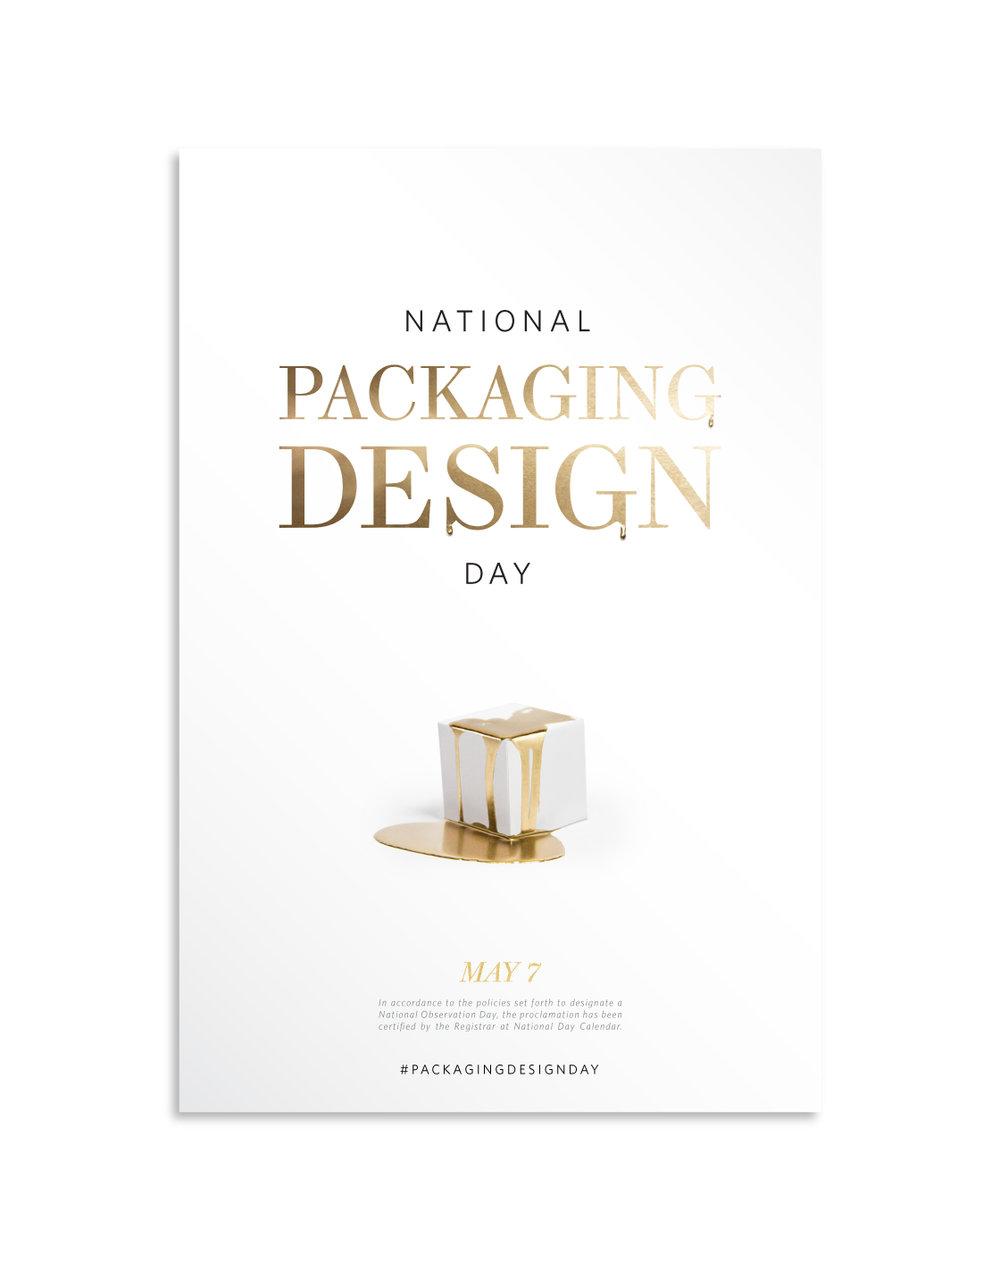 national-packaging-design-day-poster.jpg